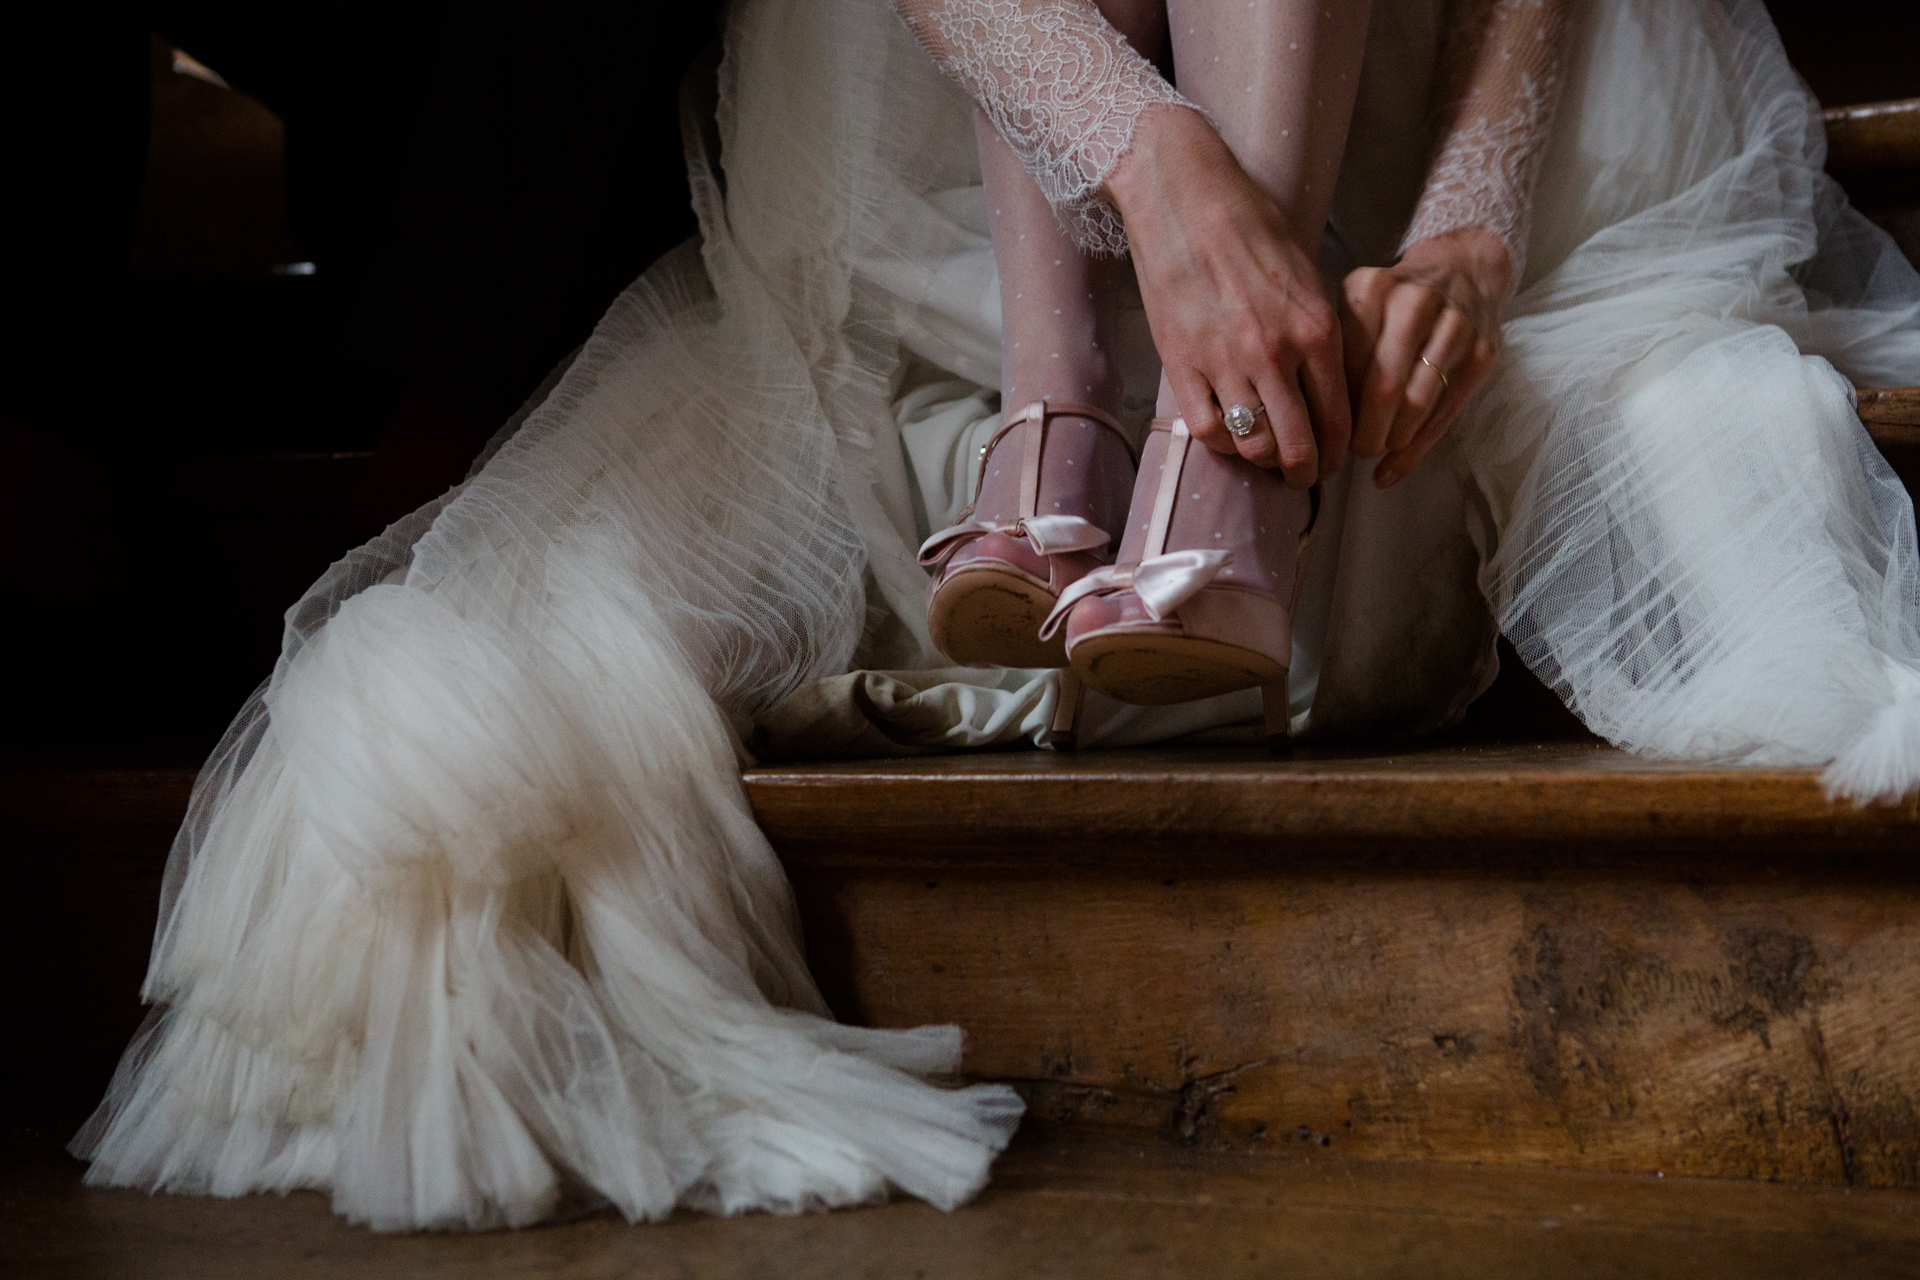 photographe-mariage-oise-paris-chantilly-senlis-keith-flament0184